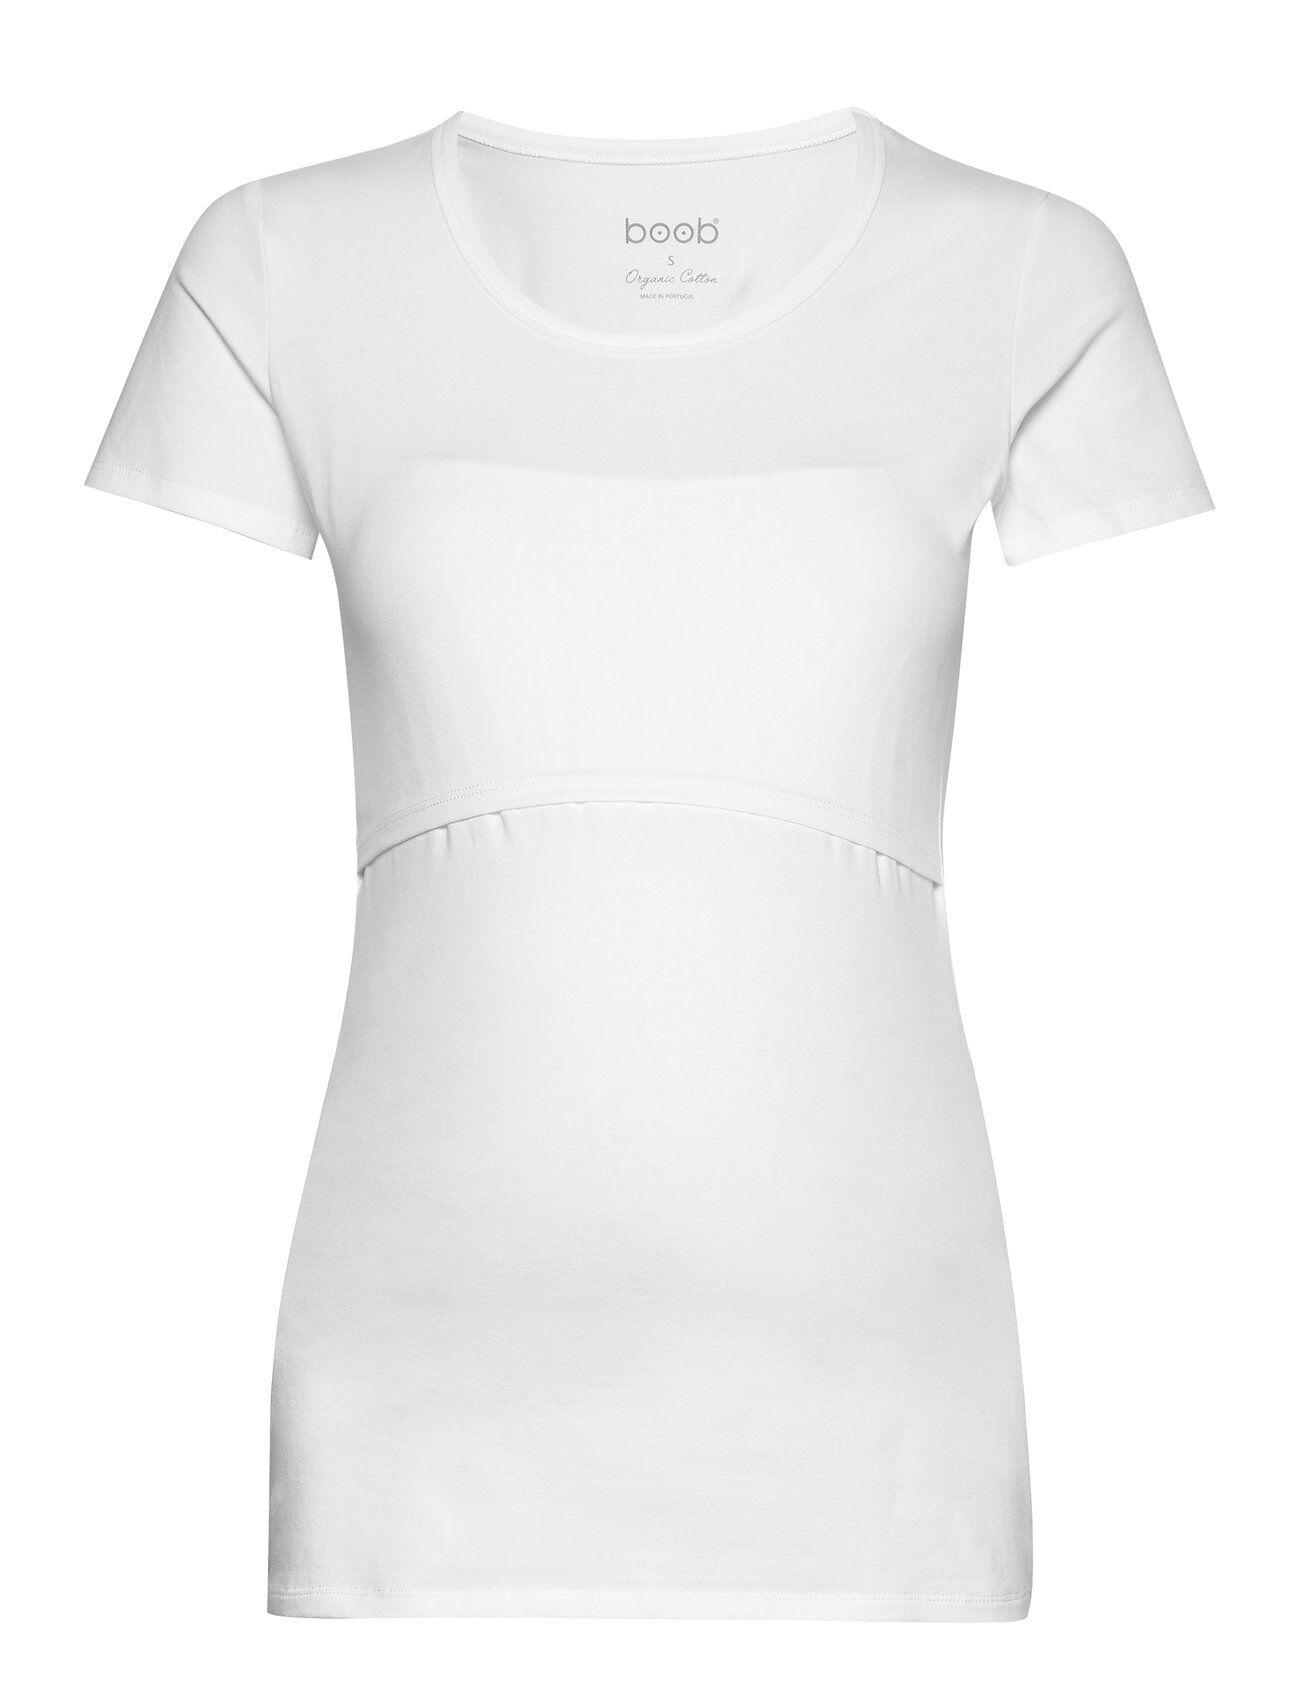 Boob Classic Short-Sleeved Top T-shirts & Tops Short-sleeved Valkoinen Boob